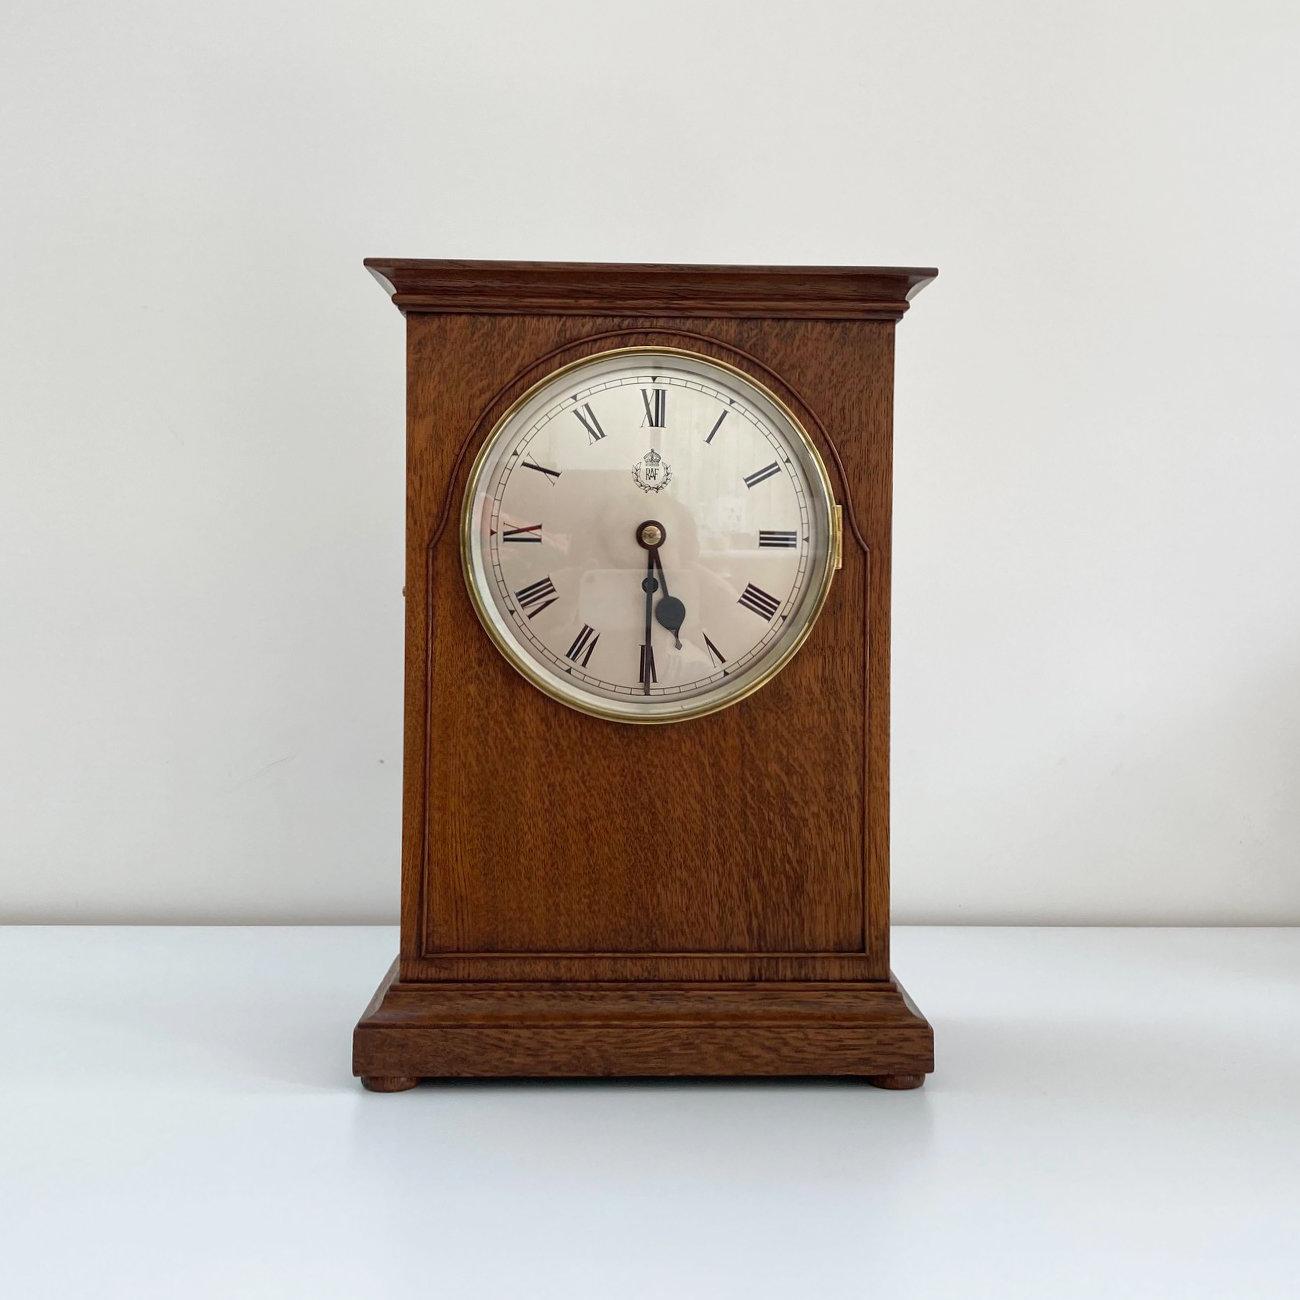 World War 2 RAF Officers Mess Mantle clock by FW Elliott & Sons